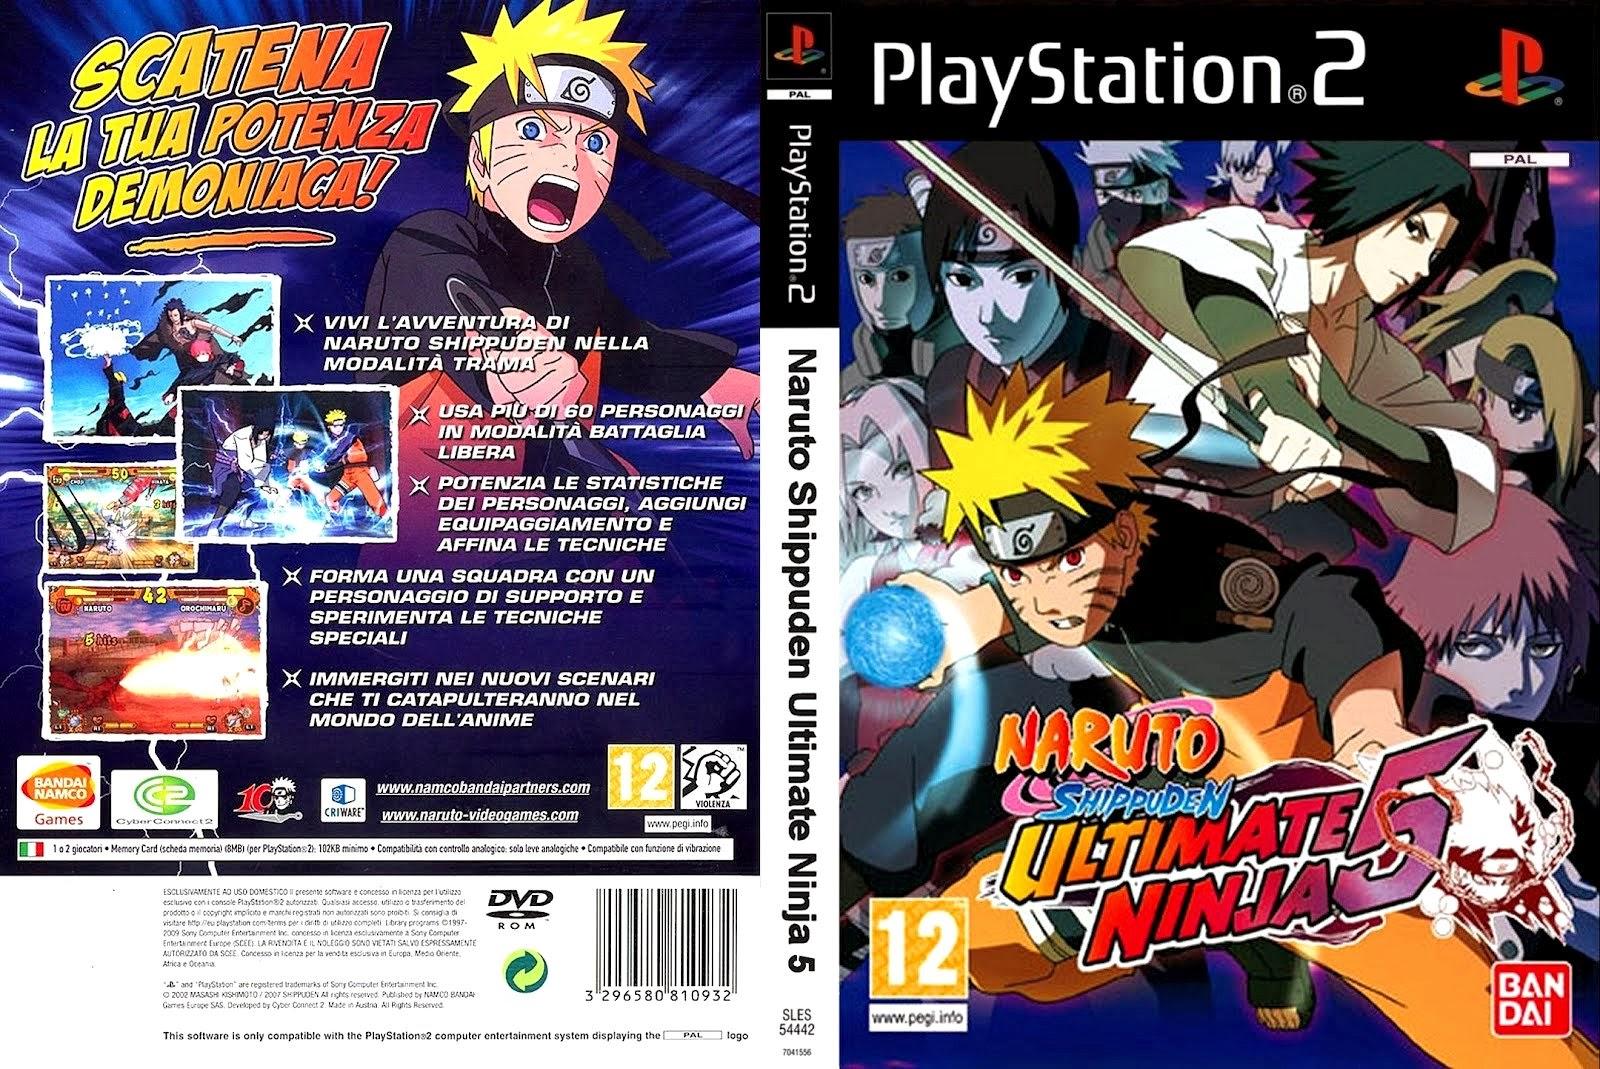 Naruto Shippuden Ultimate Ninja 5 Playstation 2 Ultra